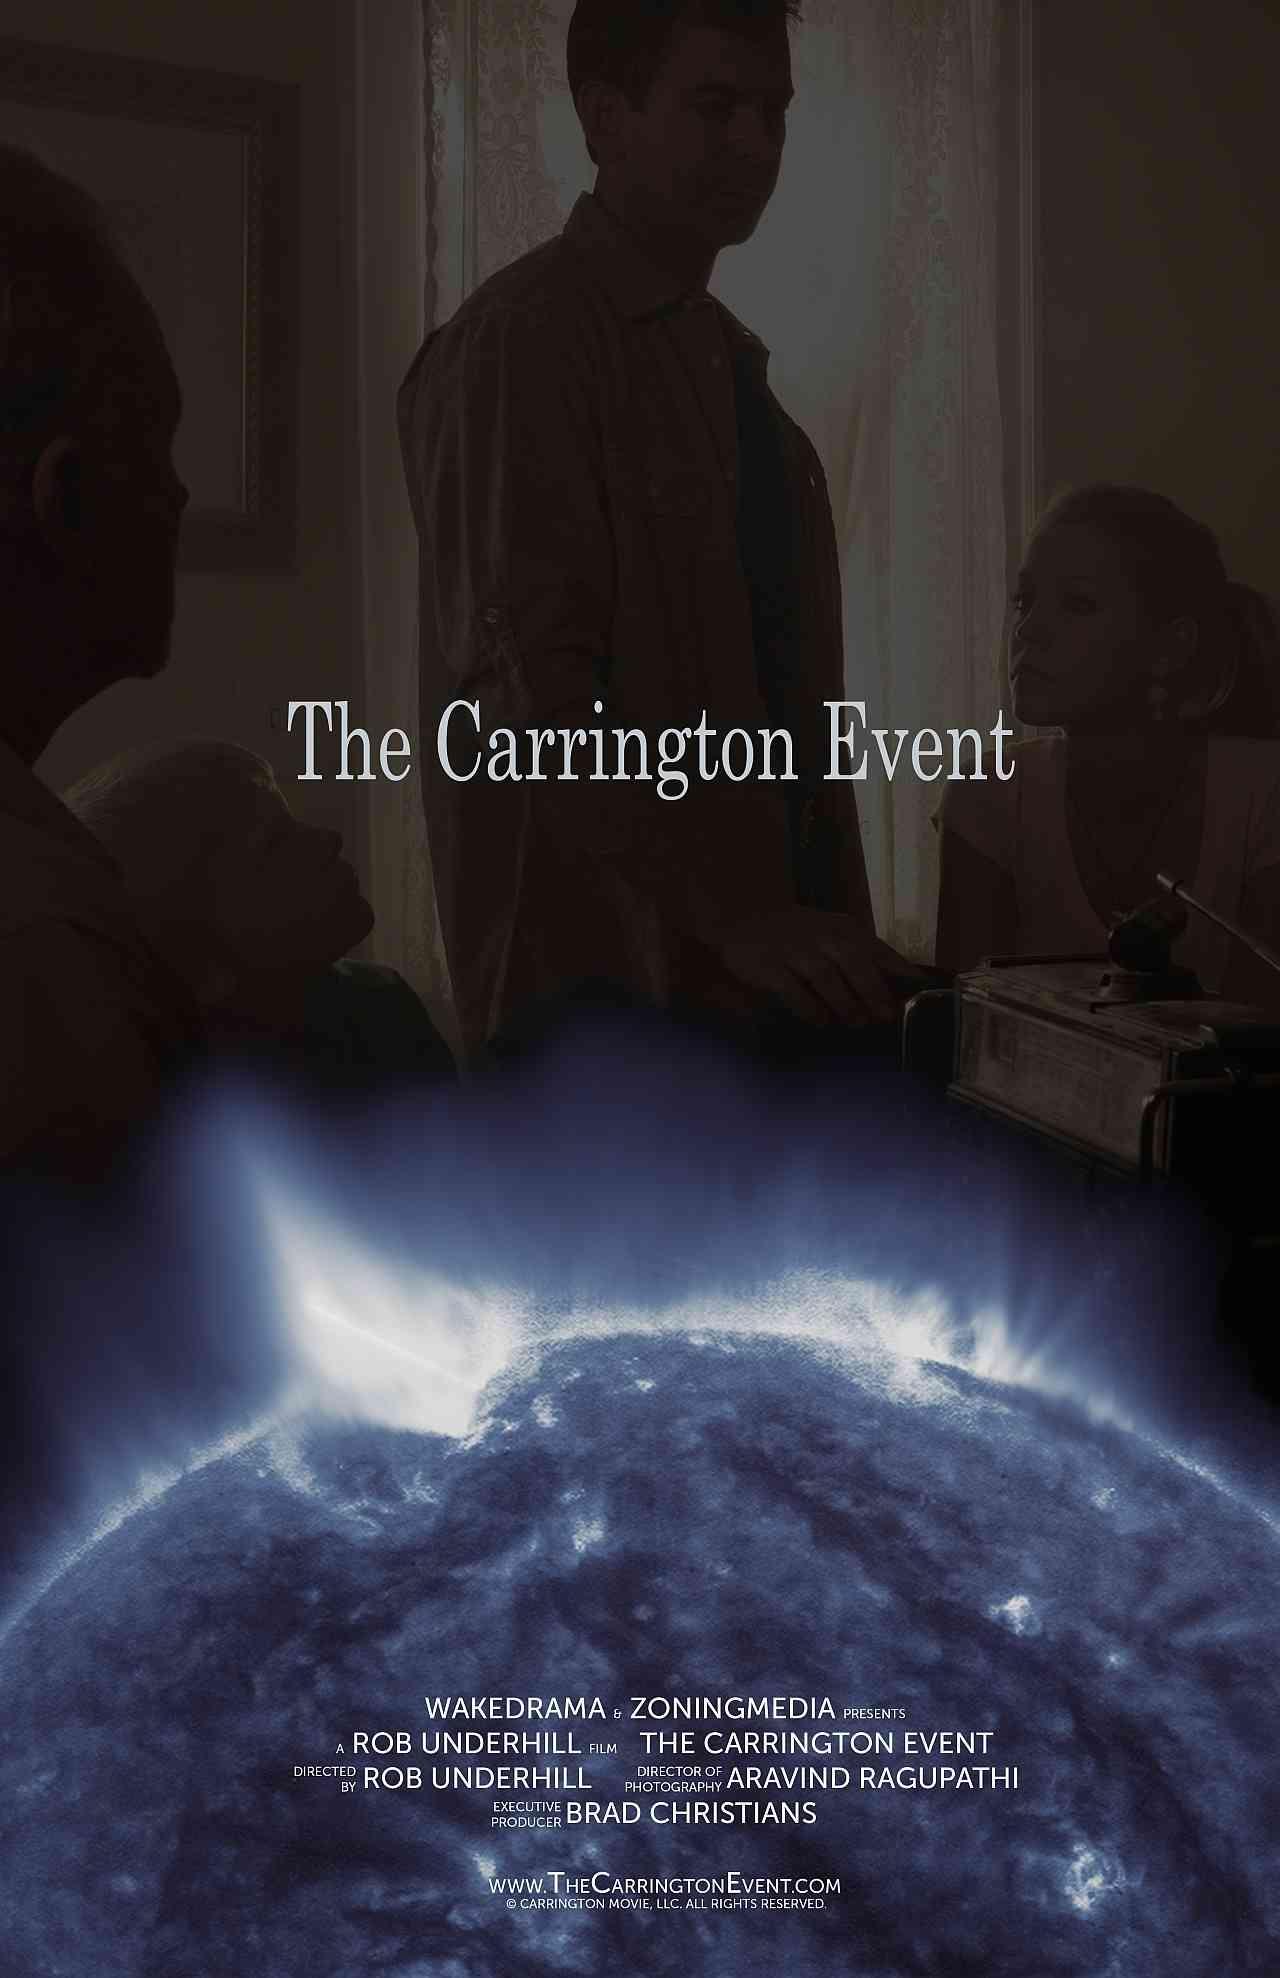 The Carrinton Event